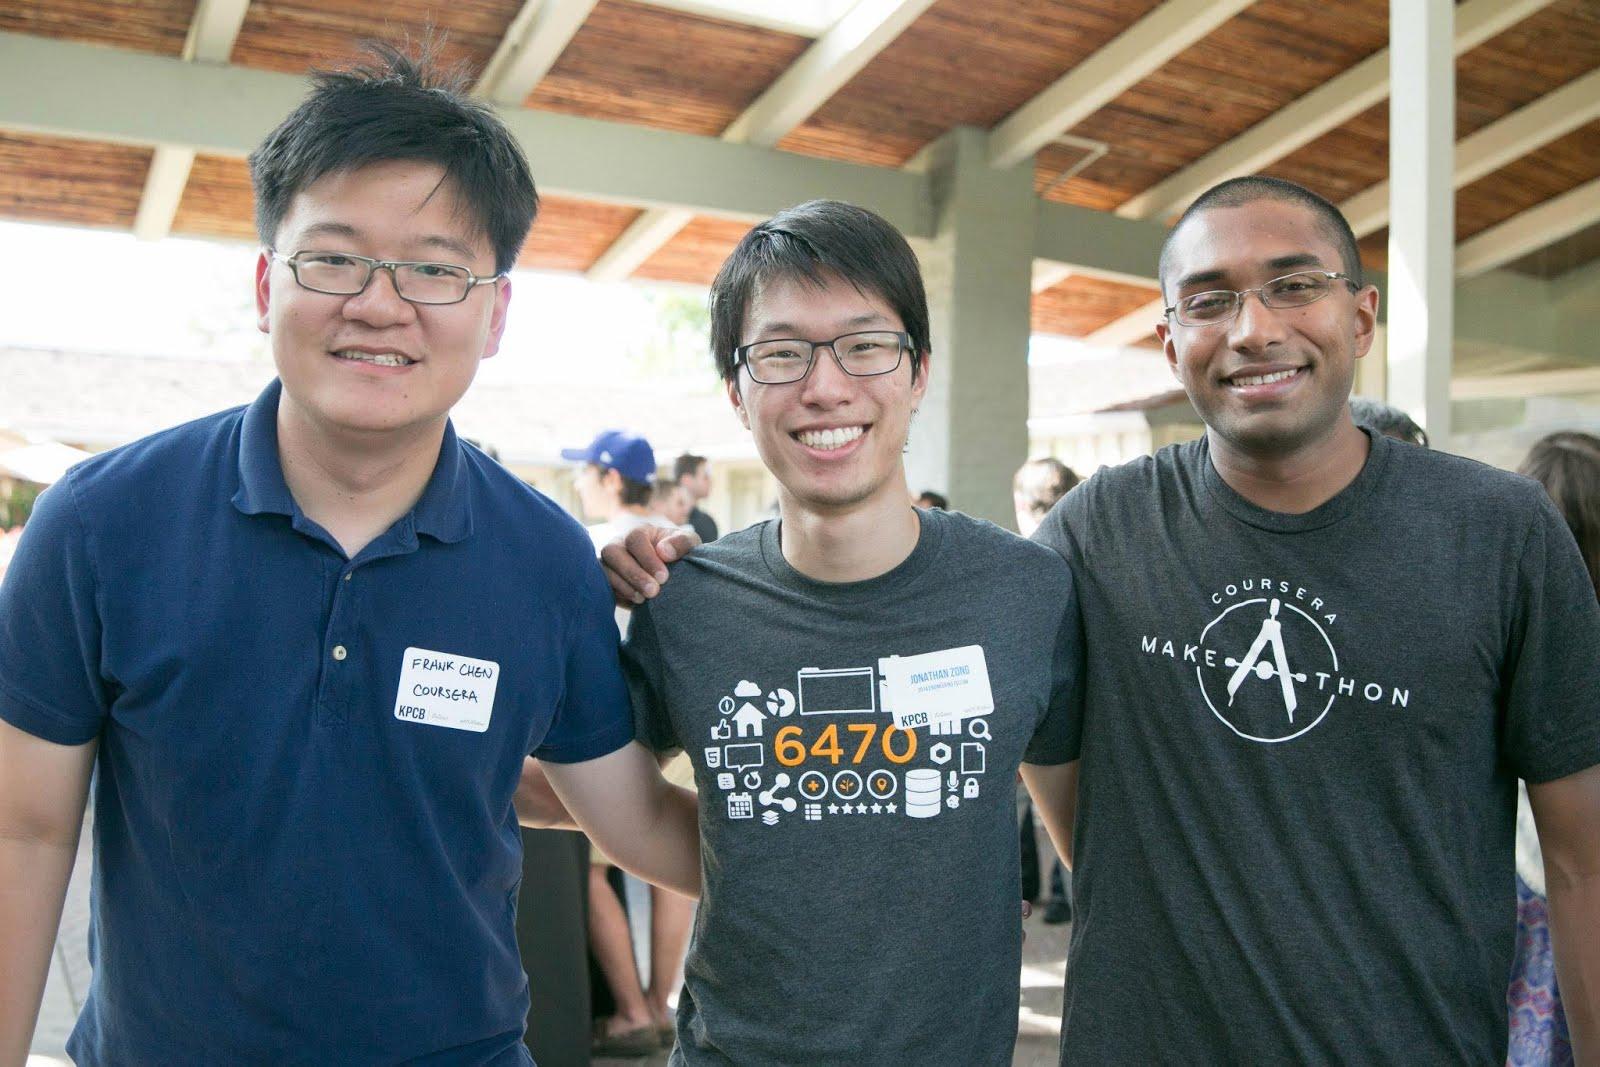 Jonathan and two Coursera engineers: Frank and Josh.